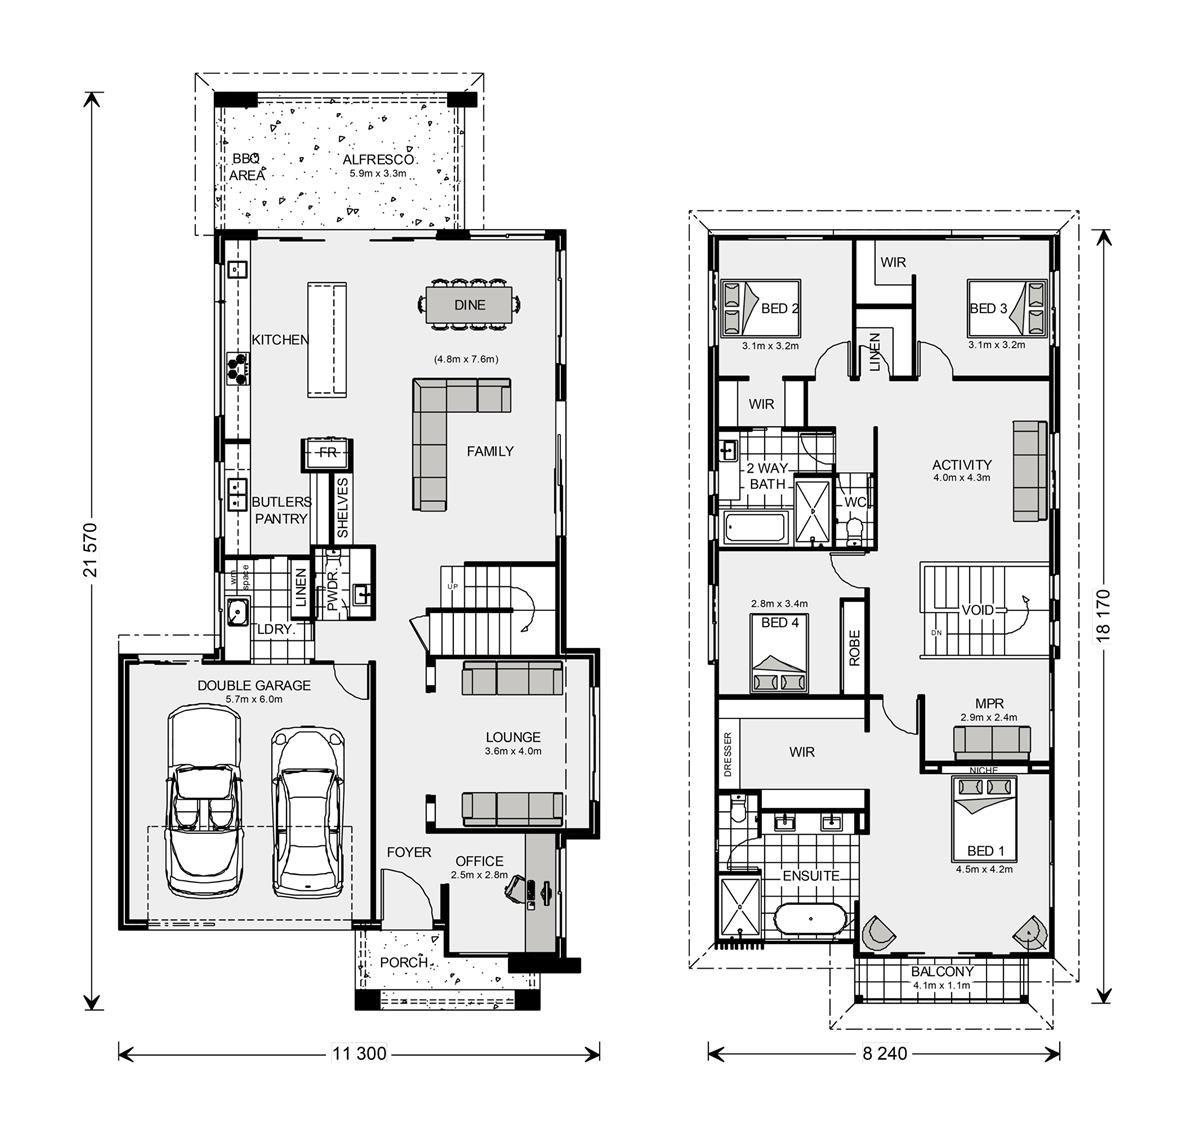 Floor Plan Kingscliff 324 Home Design Floor Plans House Design House Floor Plans